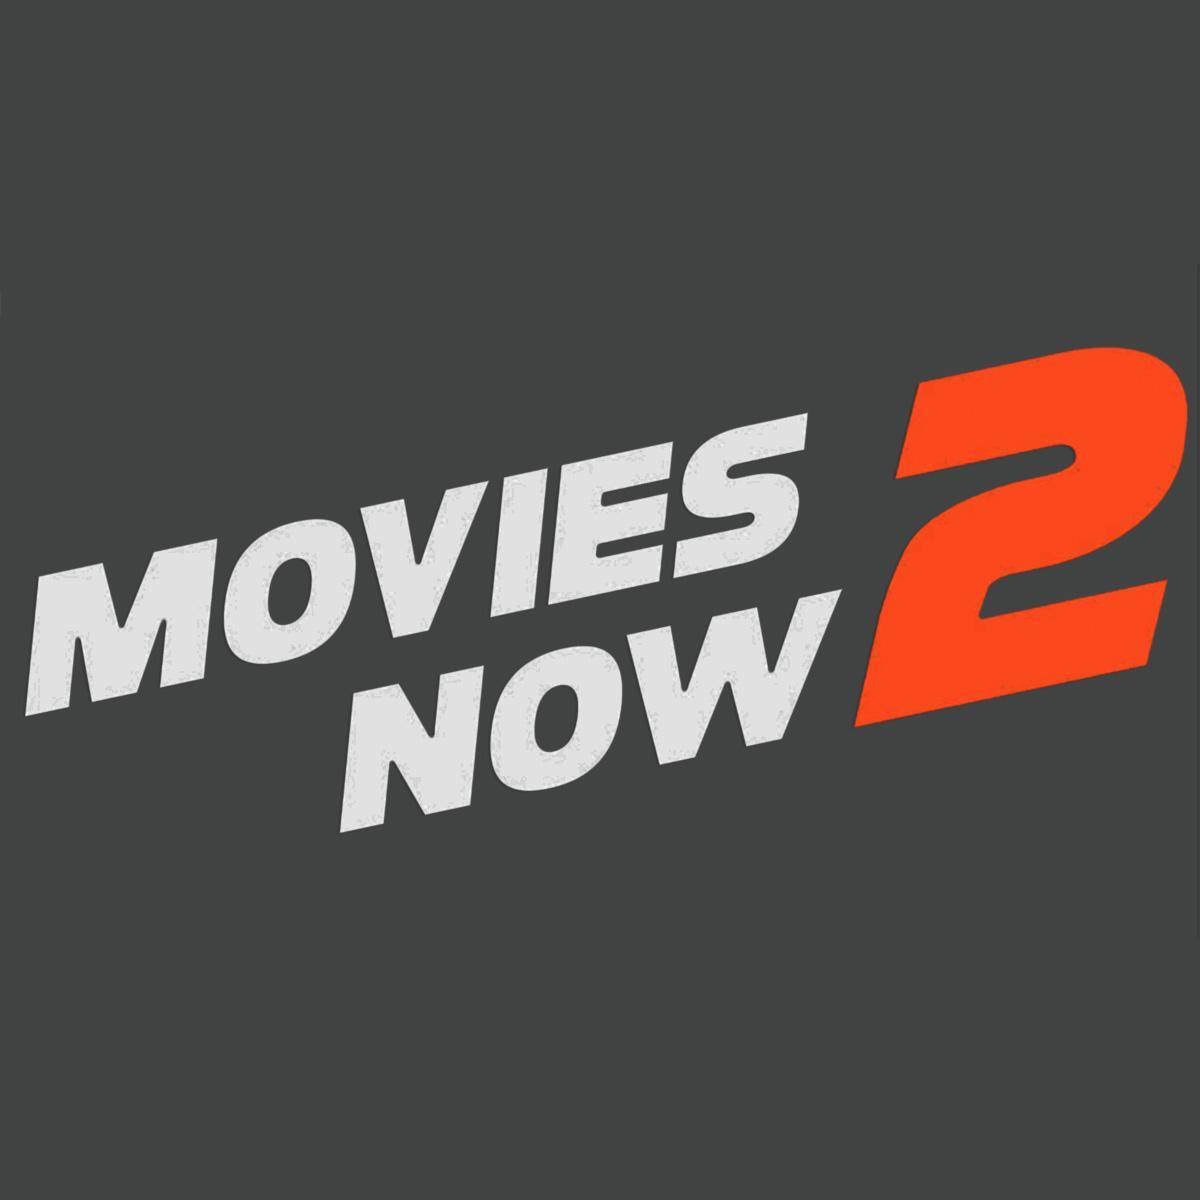 https://www.indiantelevision.com/sites/default/files/styles/smartcrop_800x800/public/images/tv-images/2016/06/24/MN2II.jpg?itok=22Up3d1_